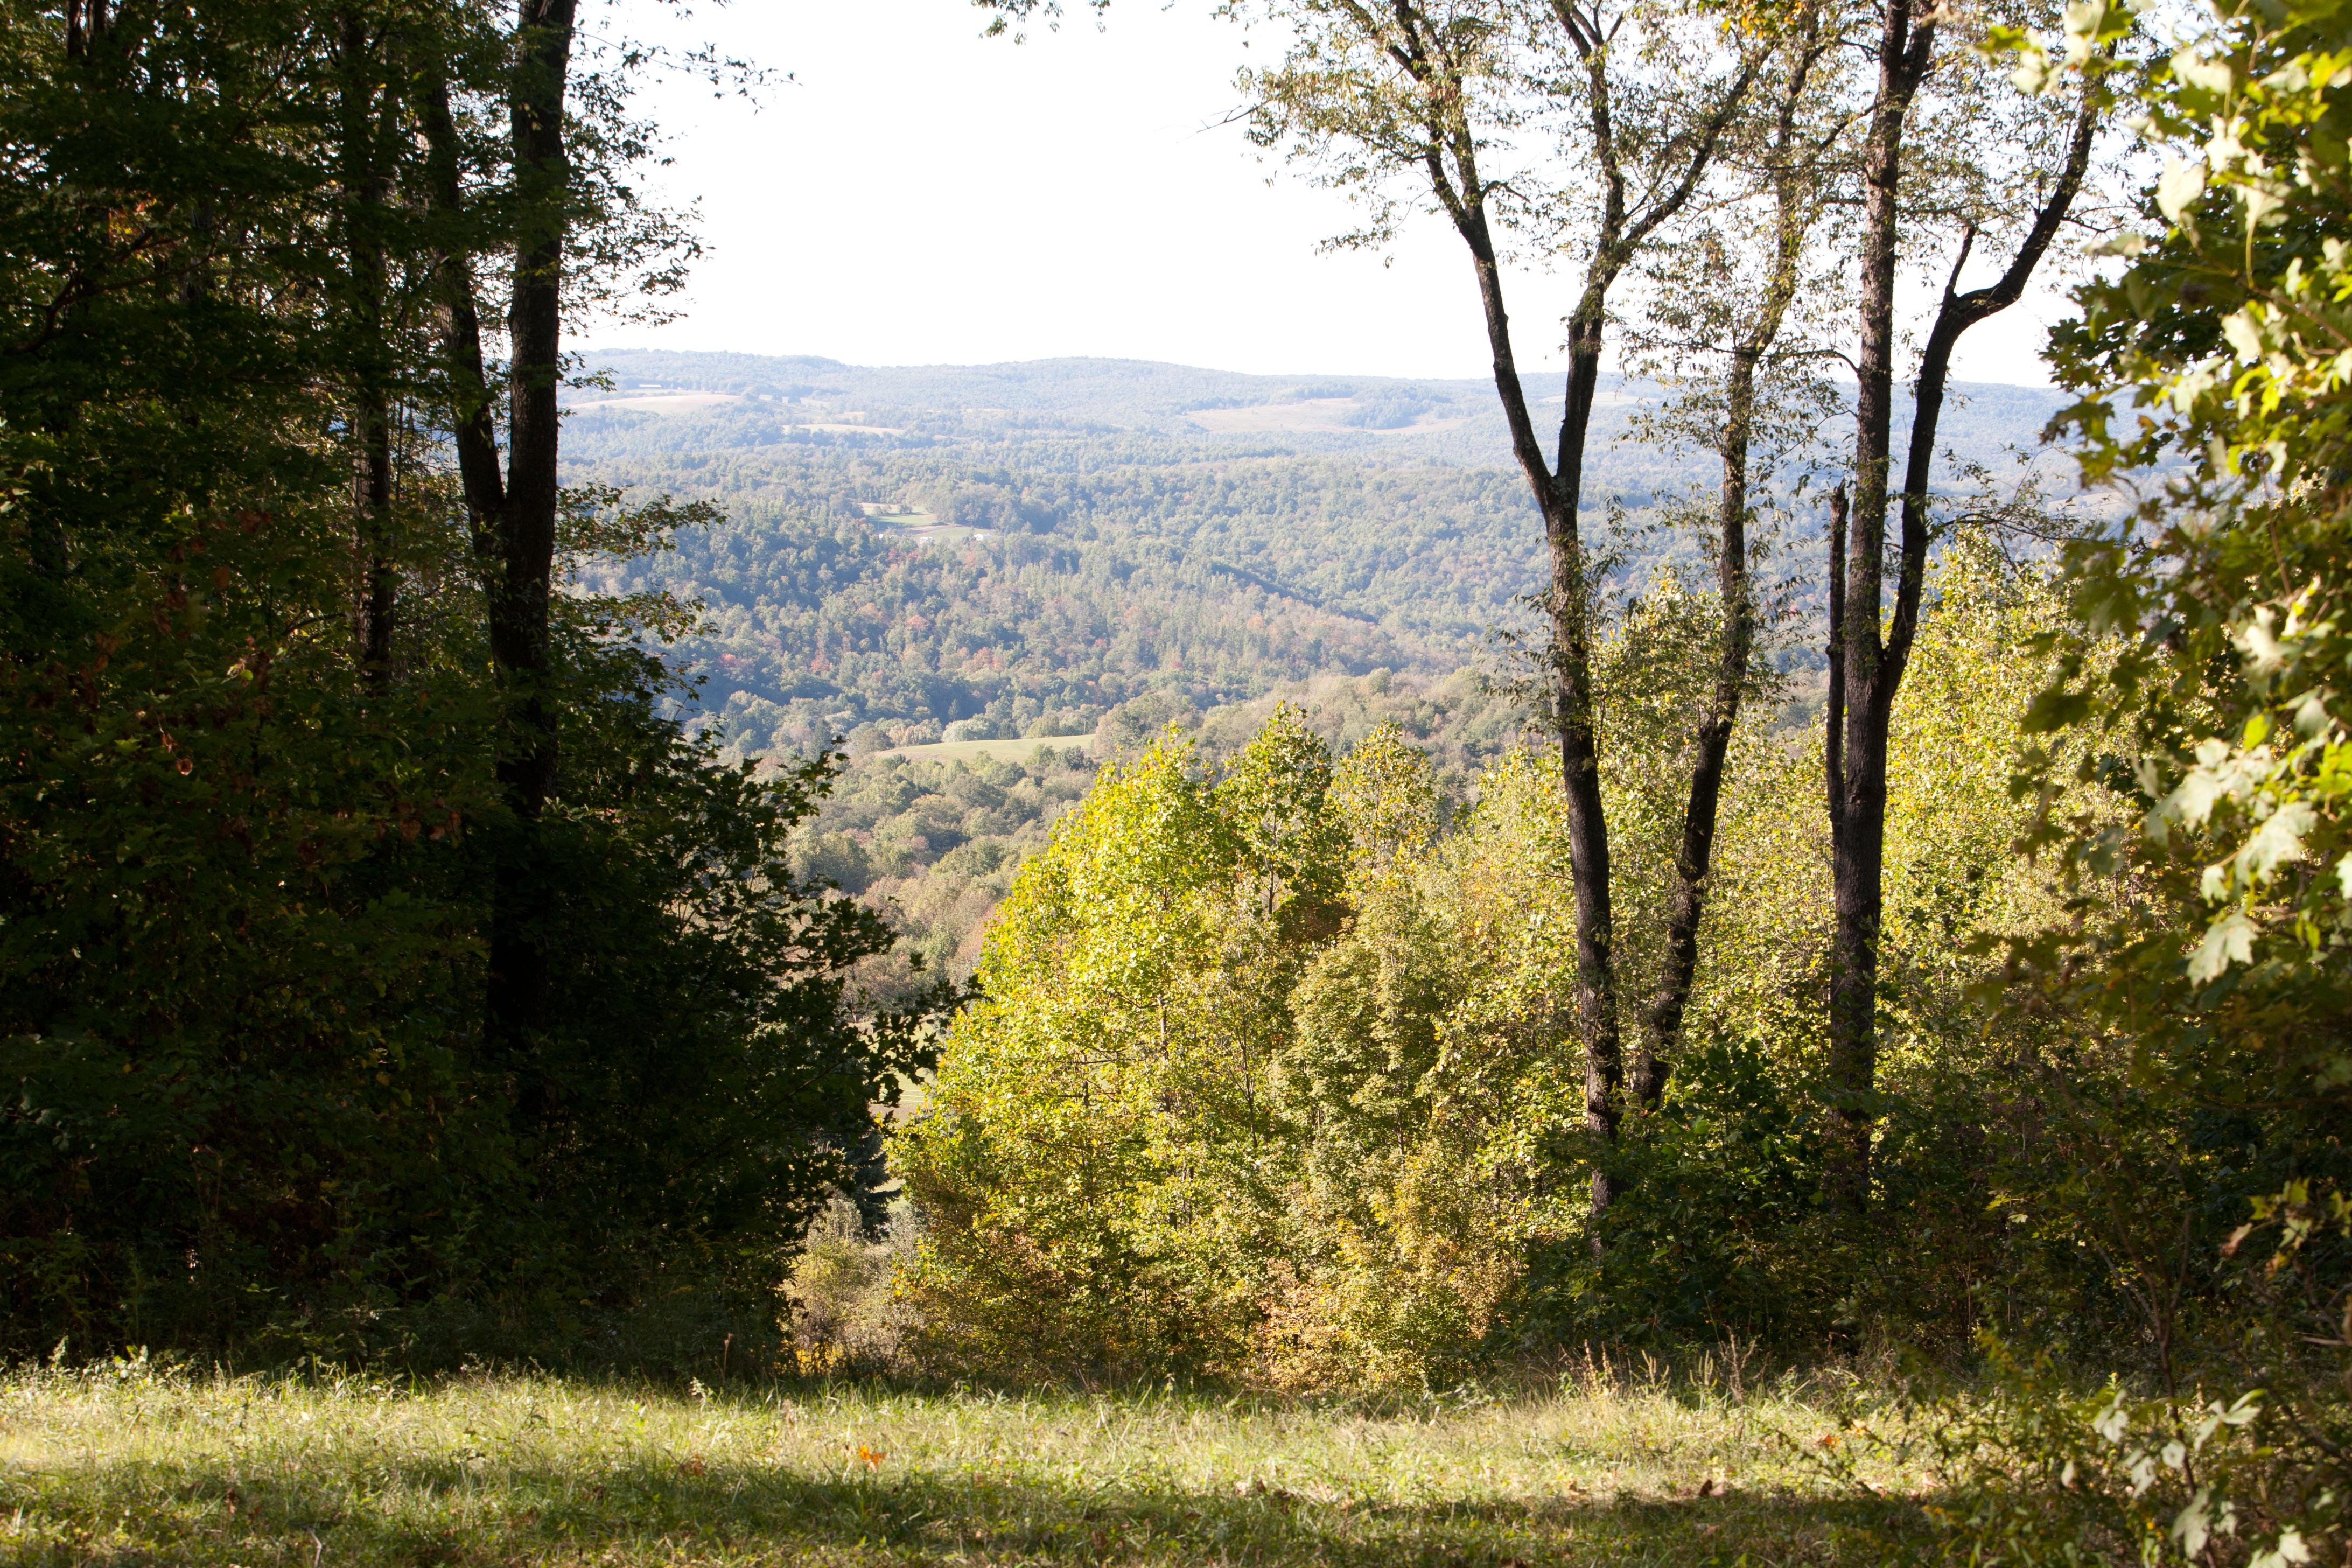 Breath taking vistas